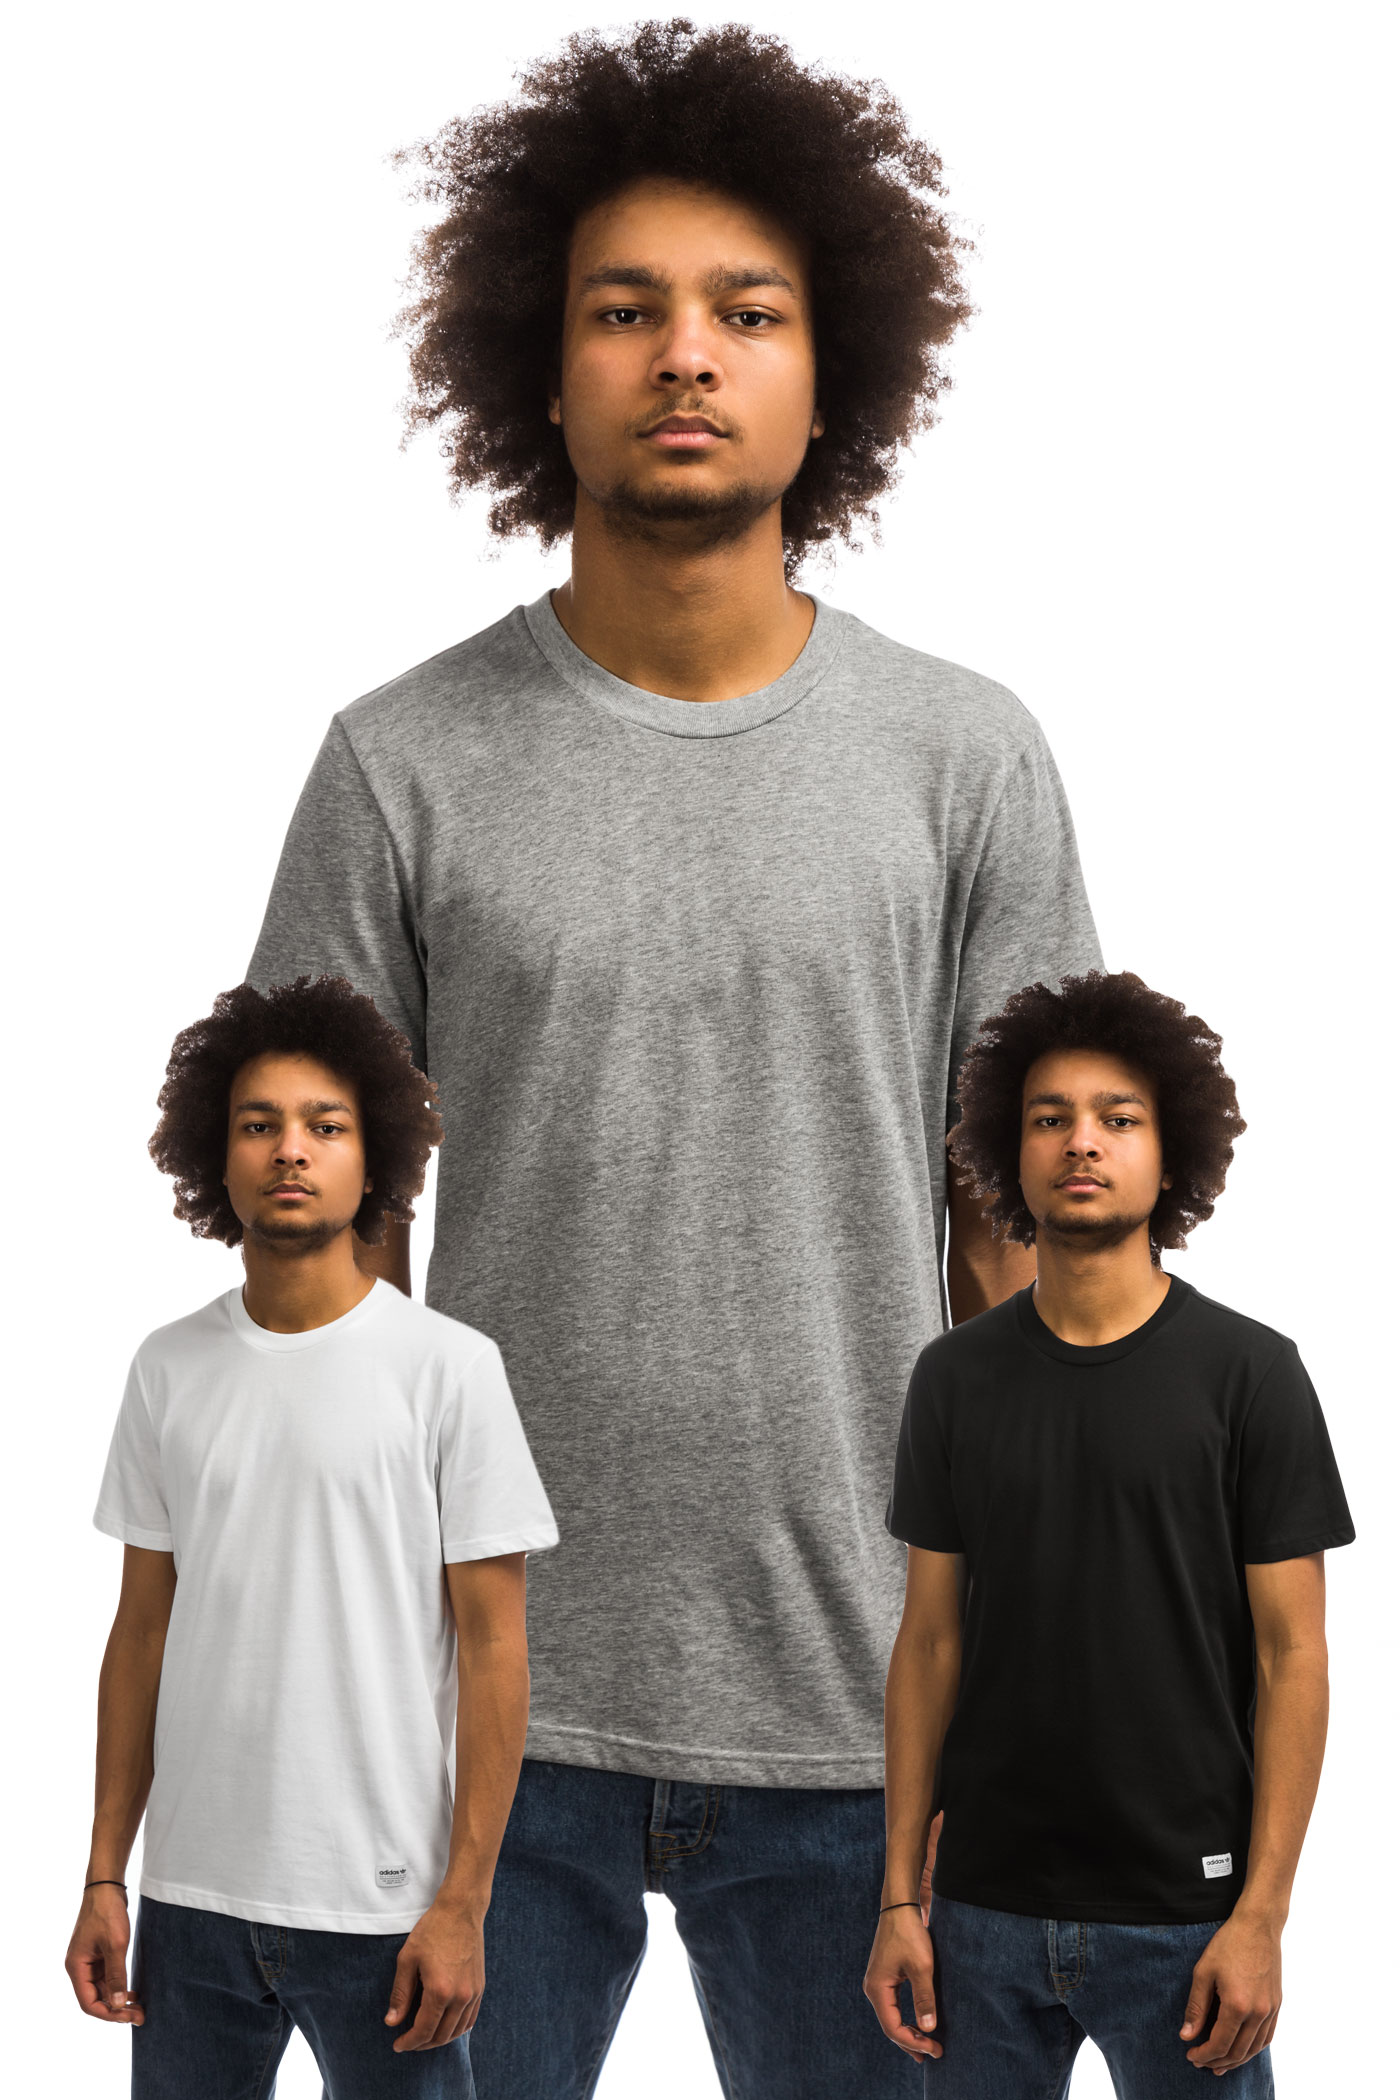 New T Adidas Packcore Black White Heather 3er shirt 4L5Rj3A